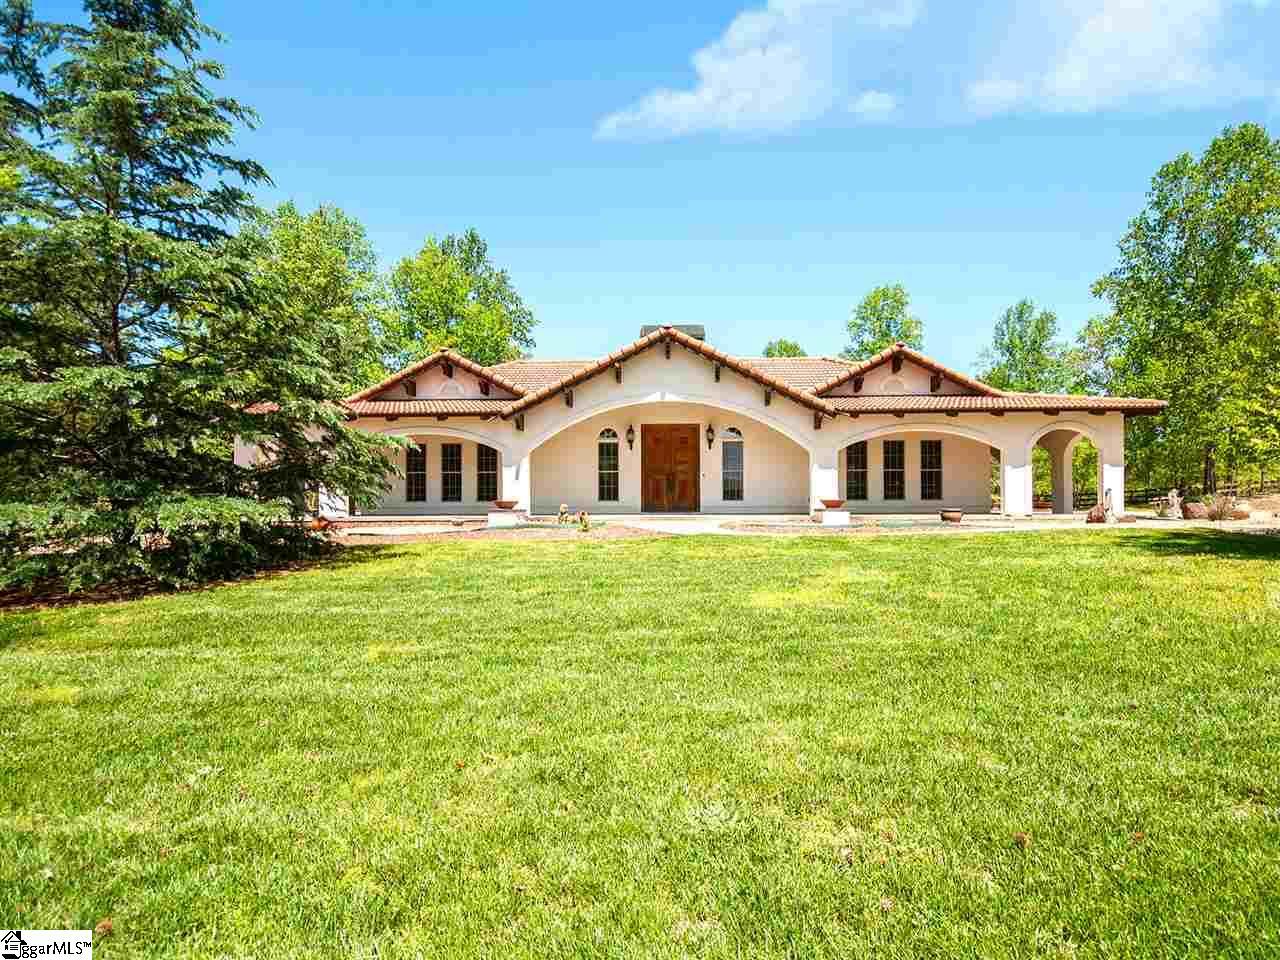 Carolina Upstate Property Management - Greer, SC - Rent Home Lease